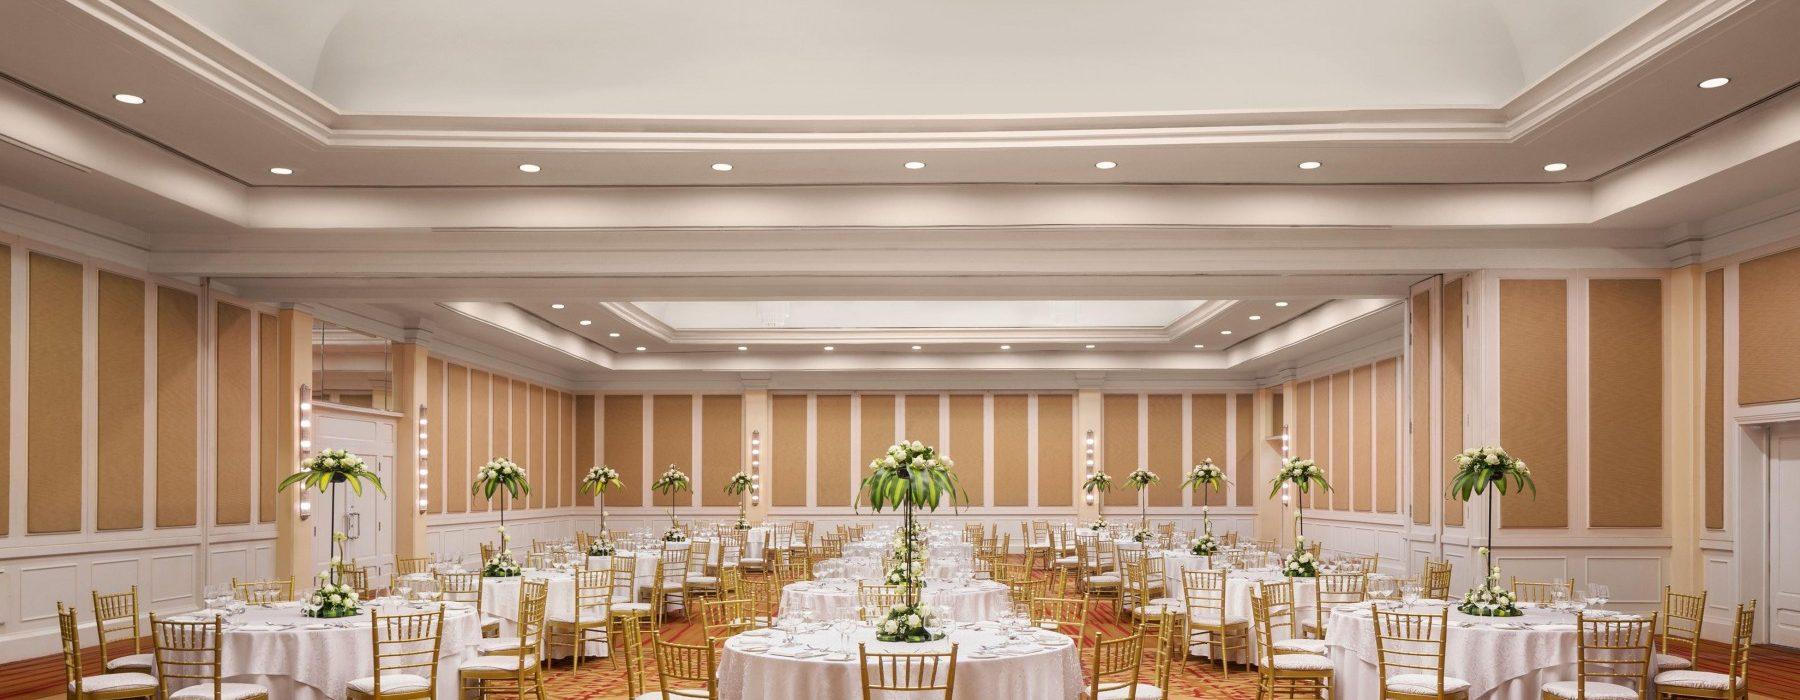 Raffles Hotel Le Royal Phnom Penh - Meetings & Events